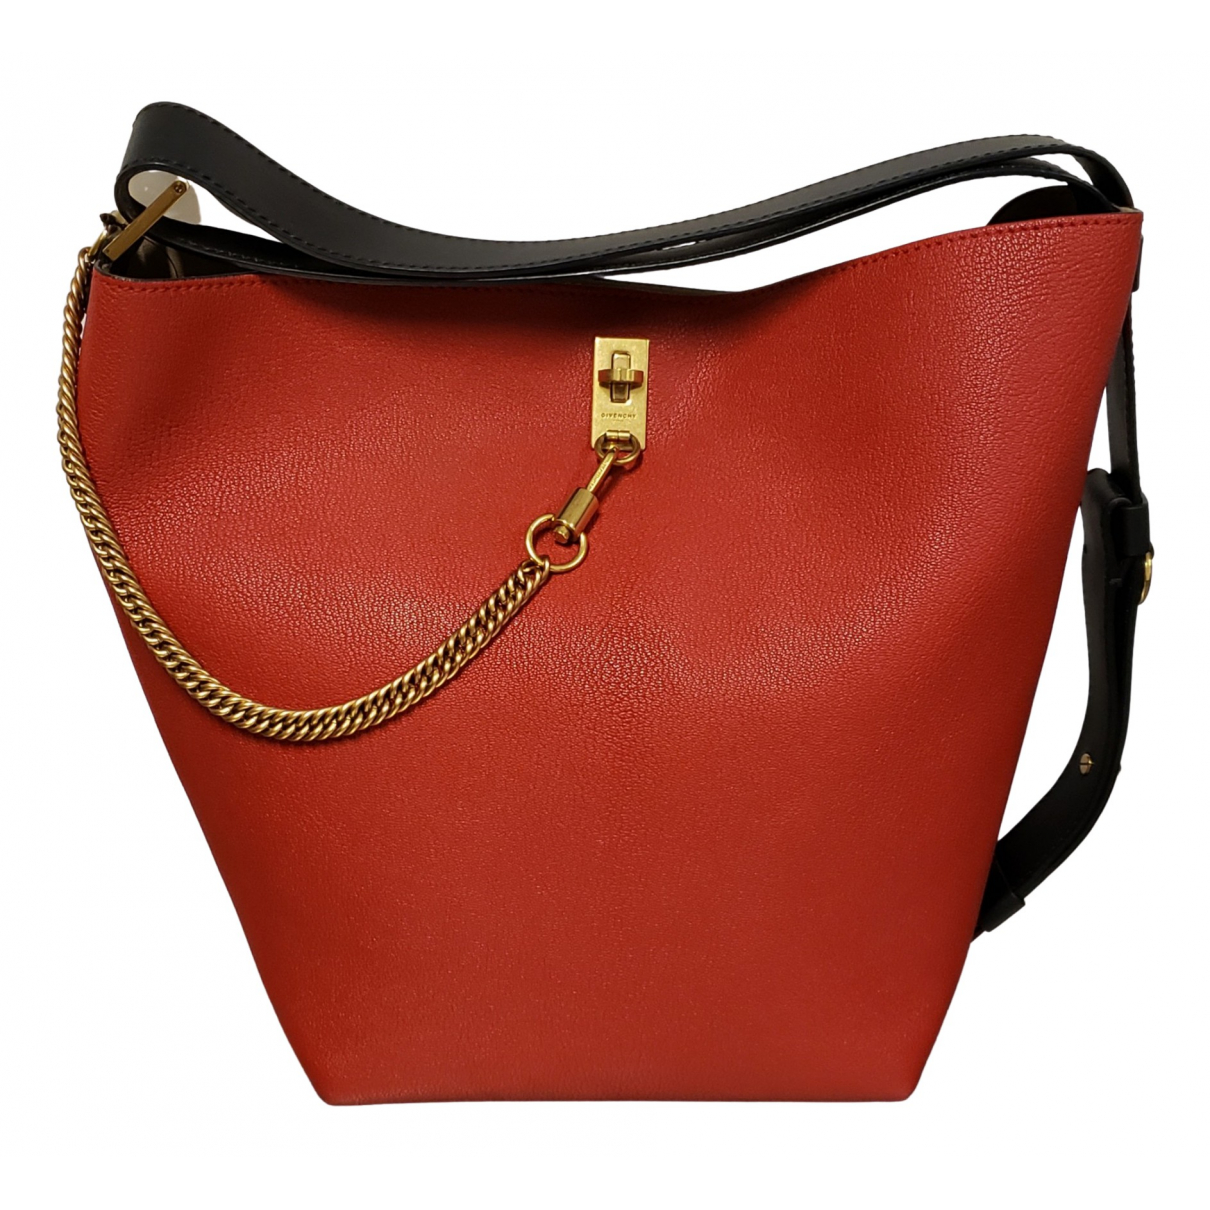 Givenchy - Sac a main Seau GV Bucket pour femme en cuir - rouge